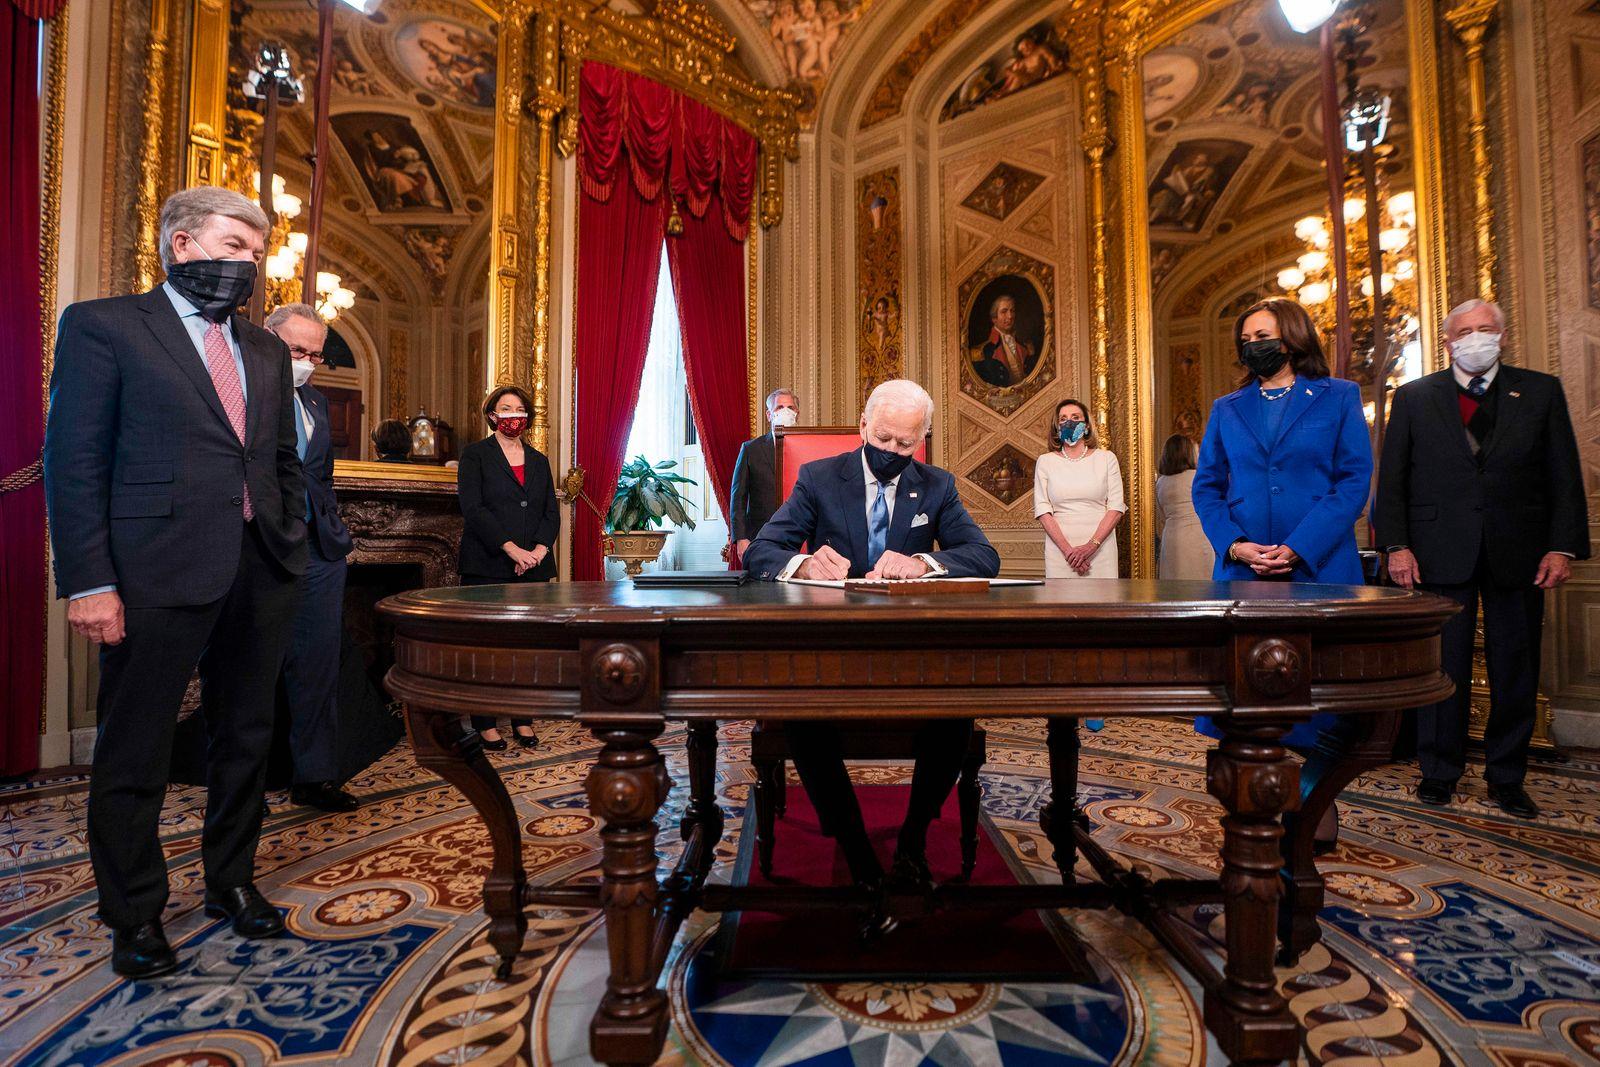 News Bilder des Tages January 20, 2021, Washington, District of Columbia, USA: US President JOE BIDEN signs three docume